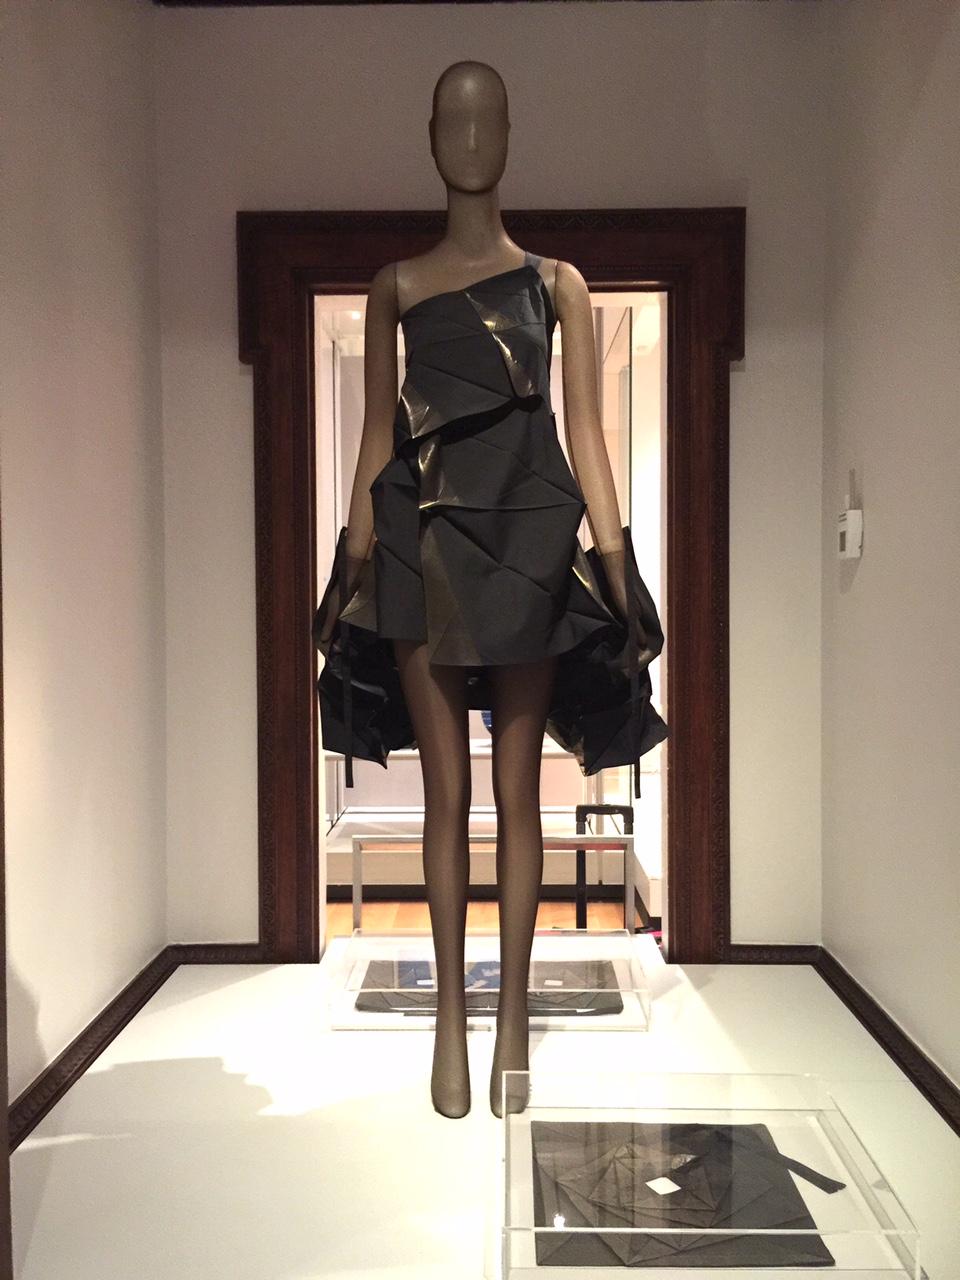 NYC-Cooper-Hewitt-museum-folded-square-dress-Sharon-Birke